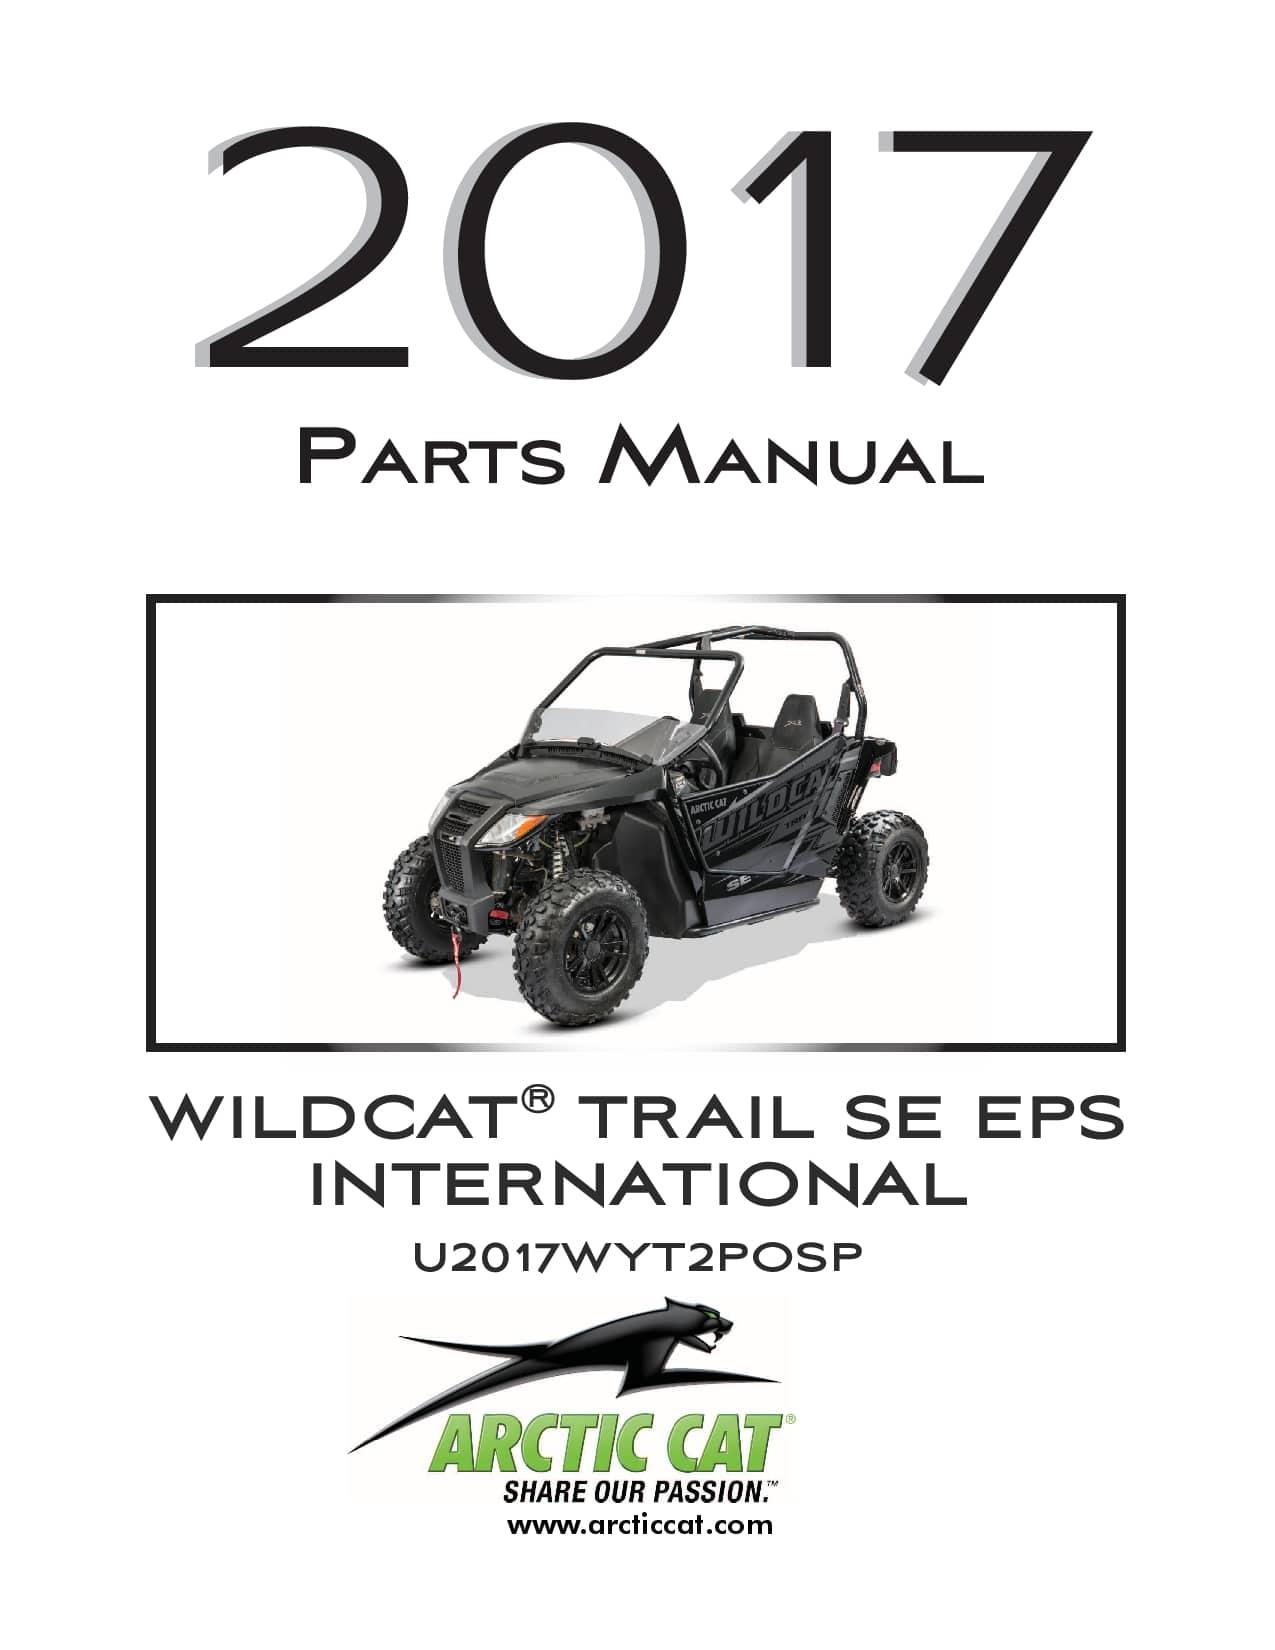 ARCTIC CAT 2017 Wildcat Trail SE EPS international black